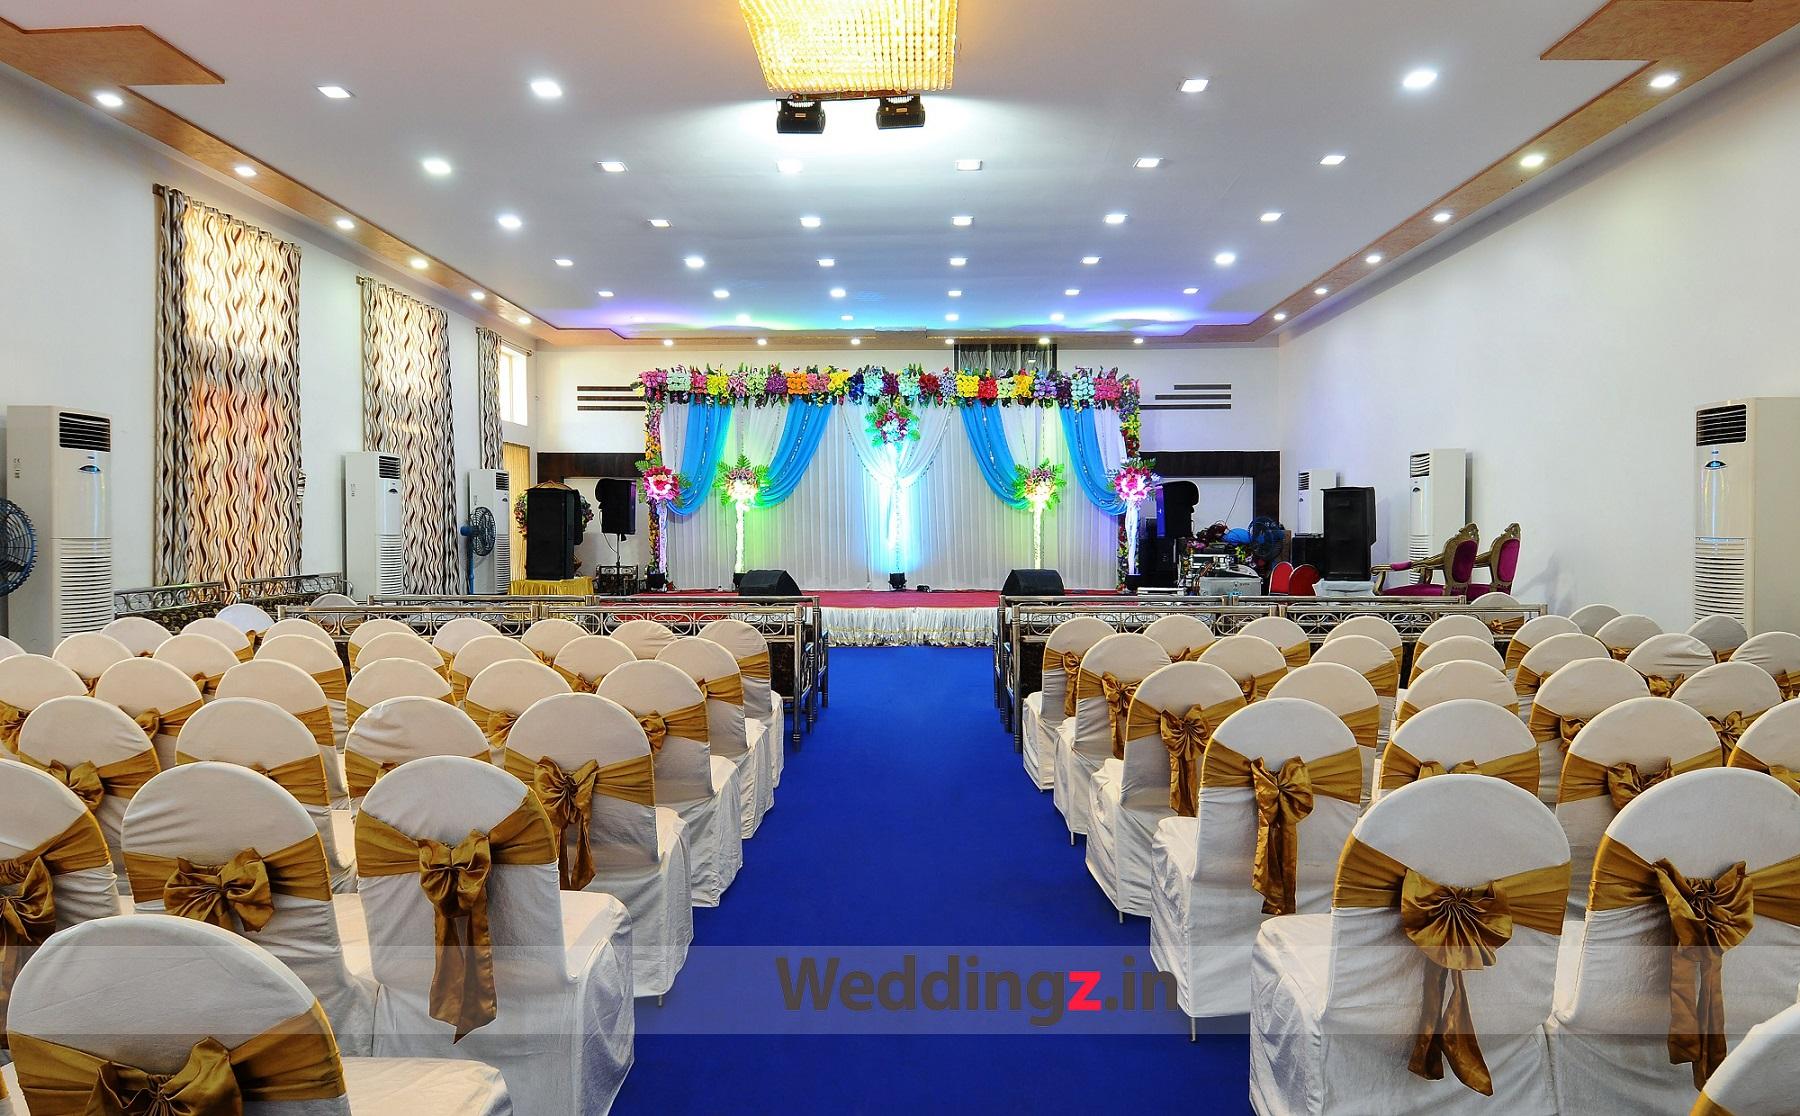 Vaishnav Banquet Marriage Amp Party Hall Kandivali West